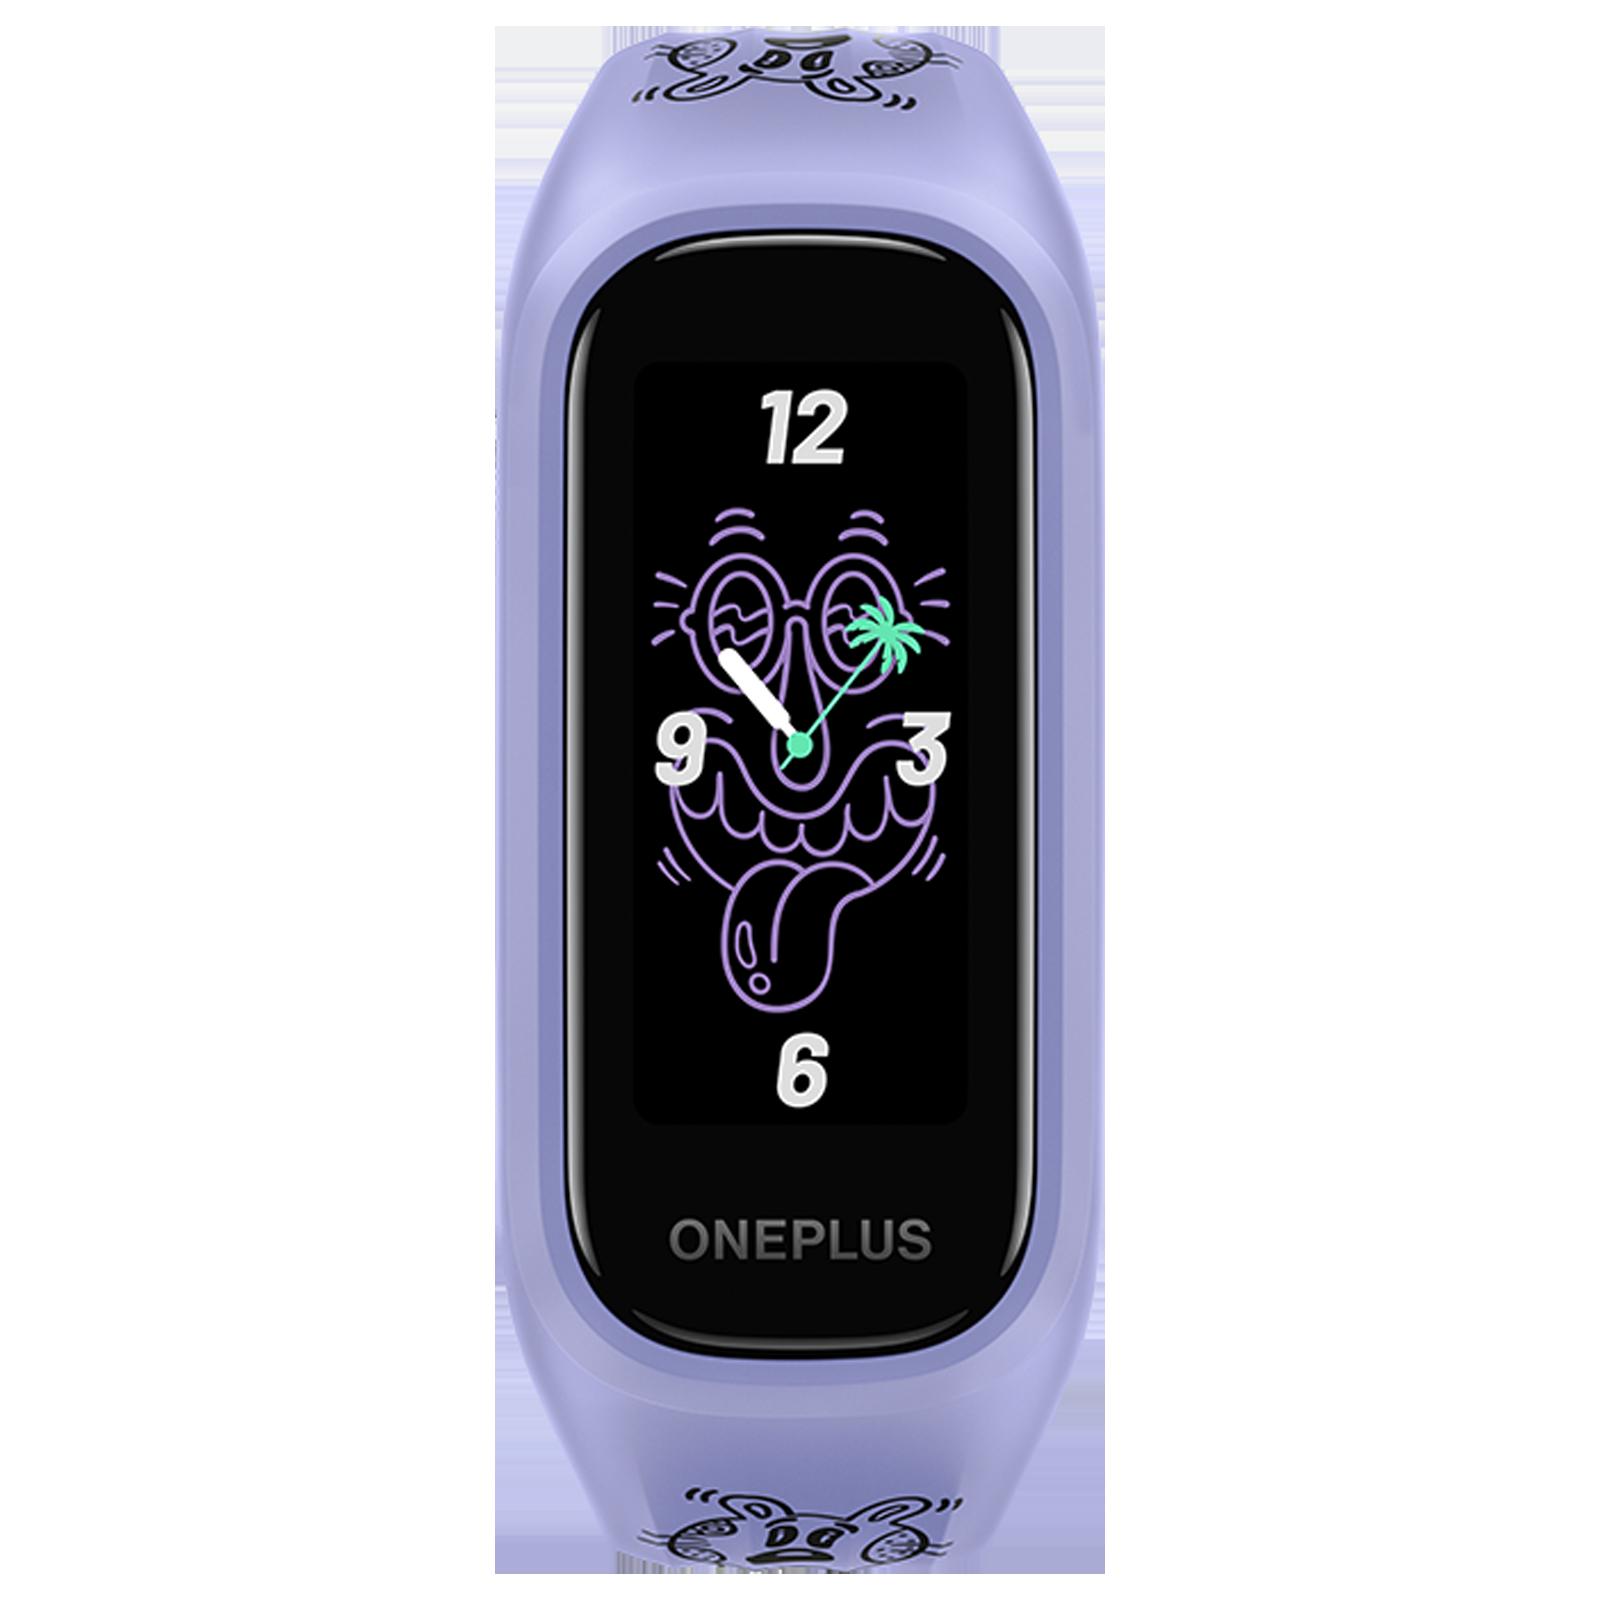 OnePlus Steven Harrington Edition Smart Band (27.9 mm) (SPO2 Monitoring, W101N, Black/Multicolor, TPU Band)_1